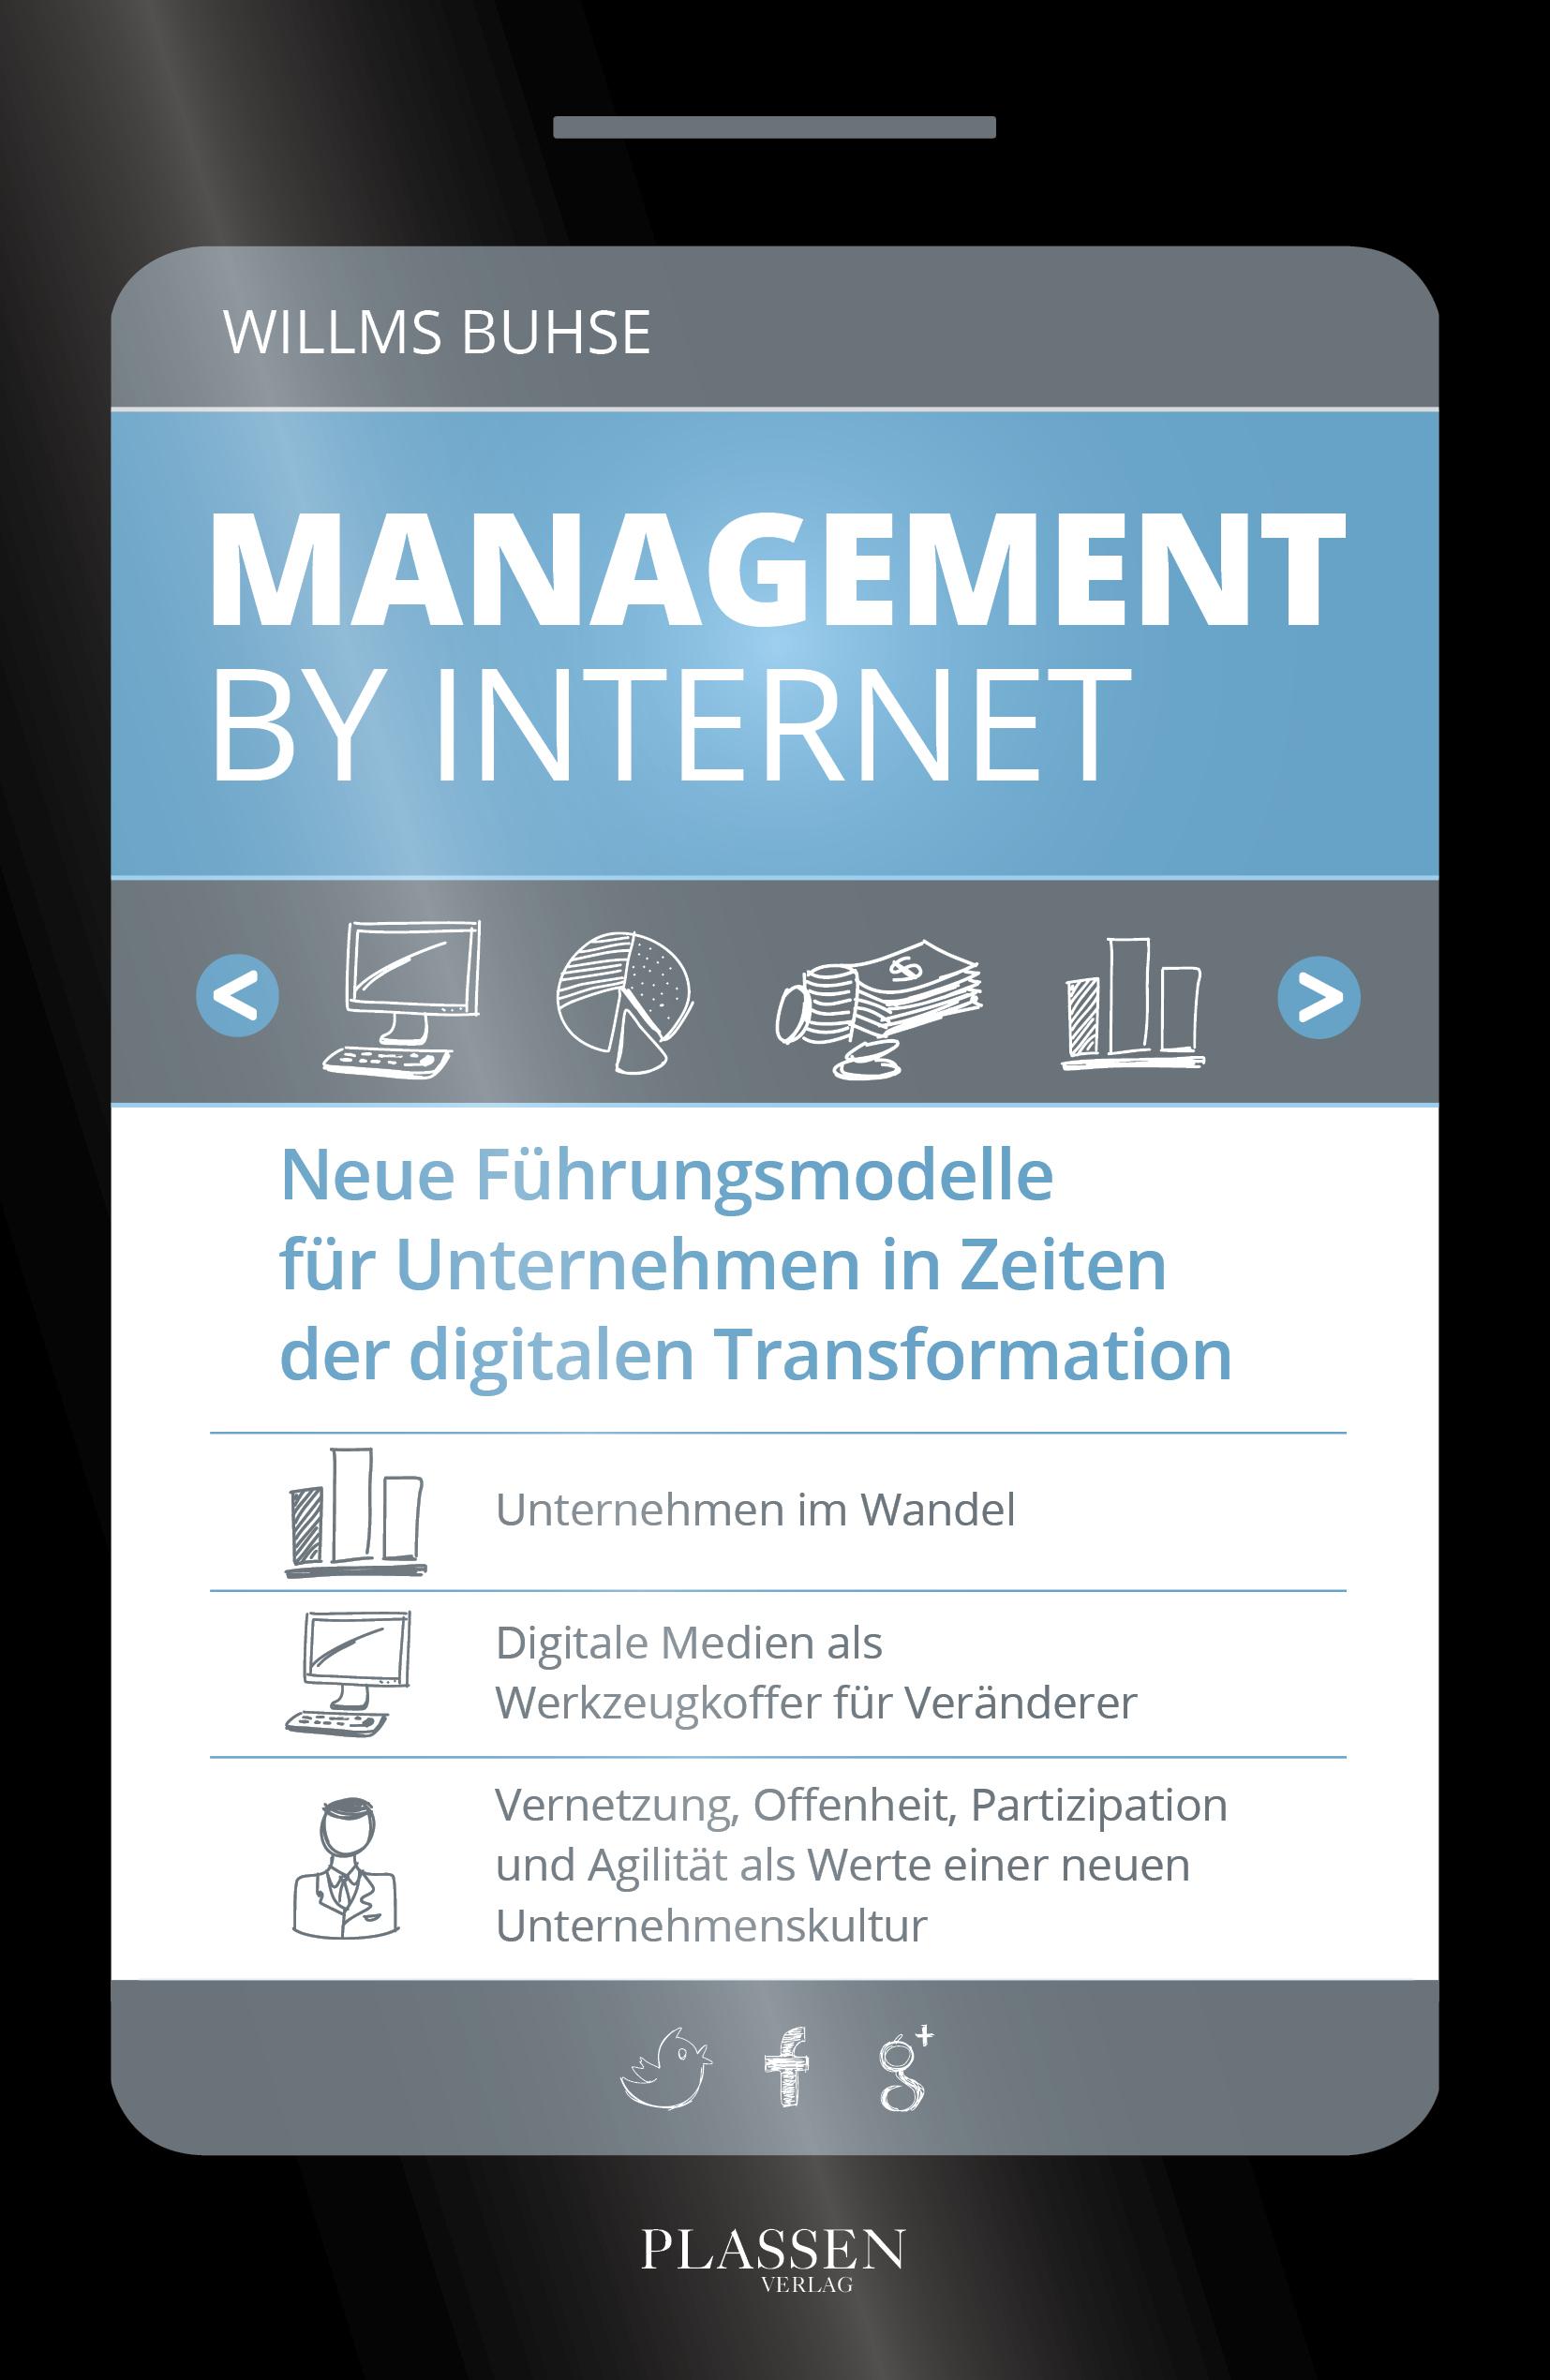 Willms Buhse Management by Internet все цены